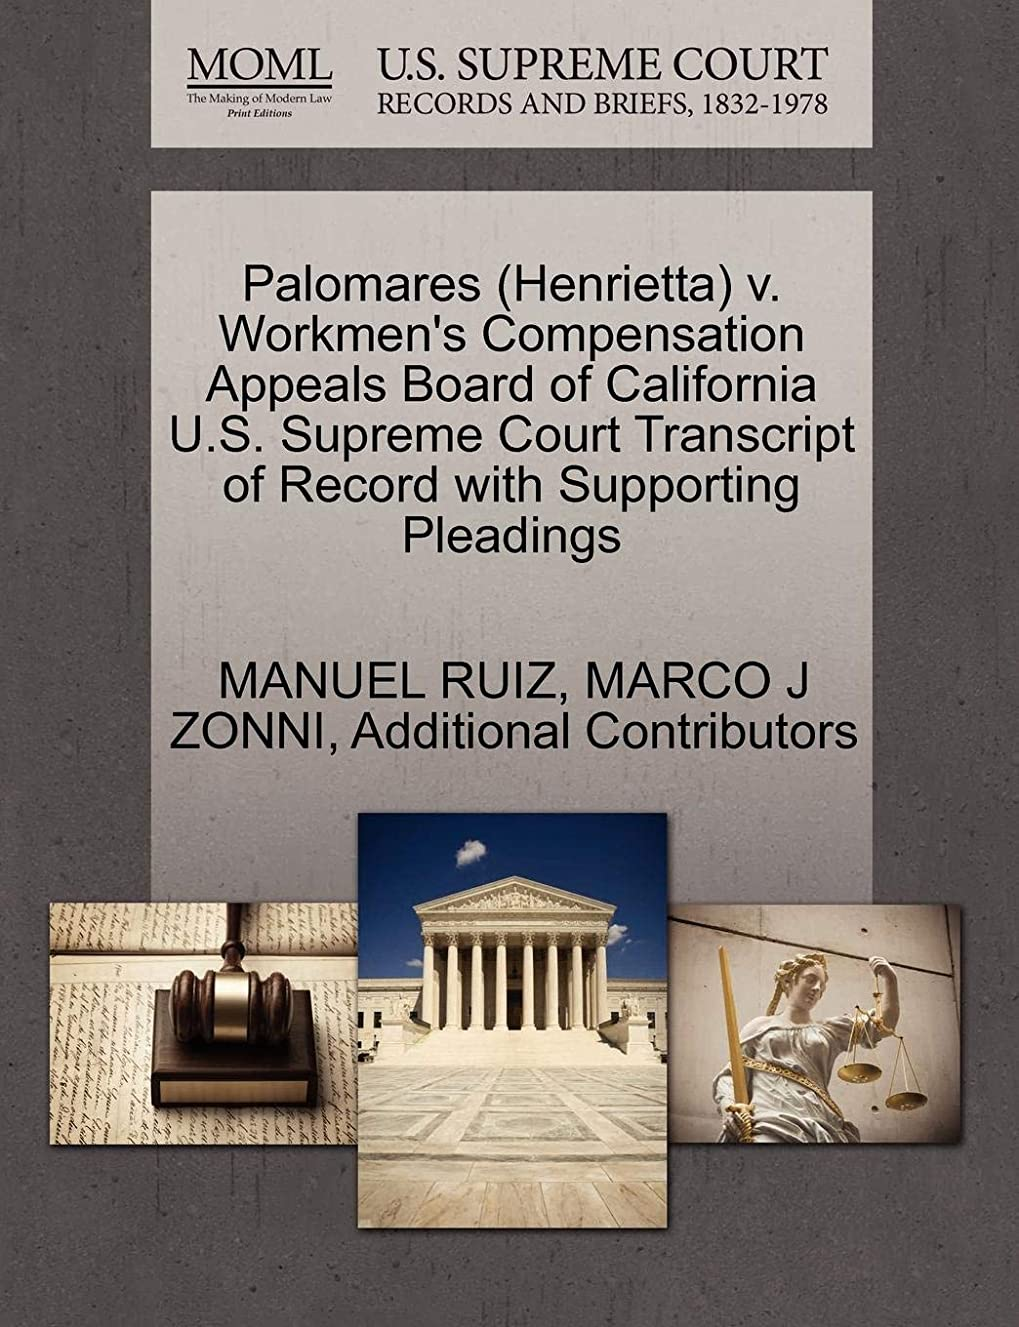 Palomares (Henrietta) v. Workmen's Compensation Appeals Board of California U.S. Supreme Court Transcript of Record with Supporting Pleadings